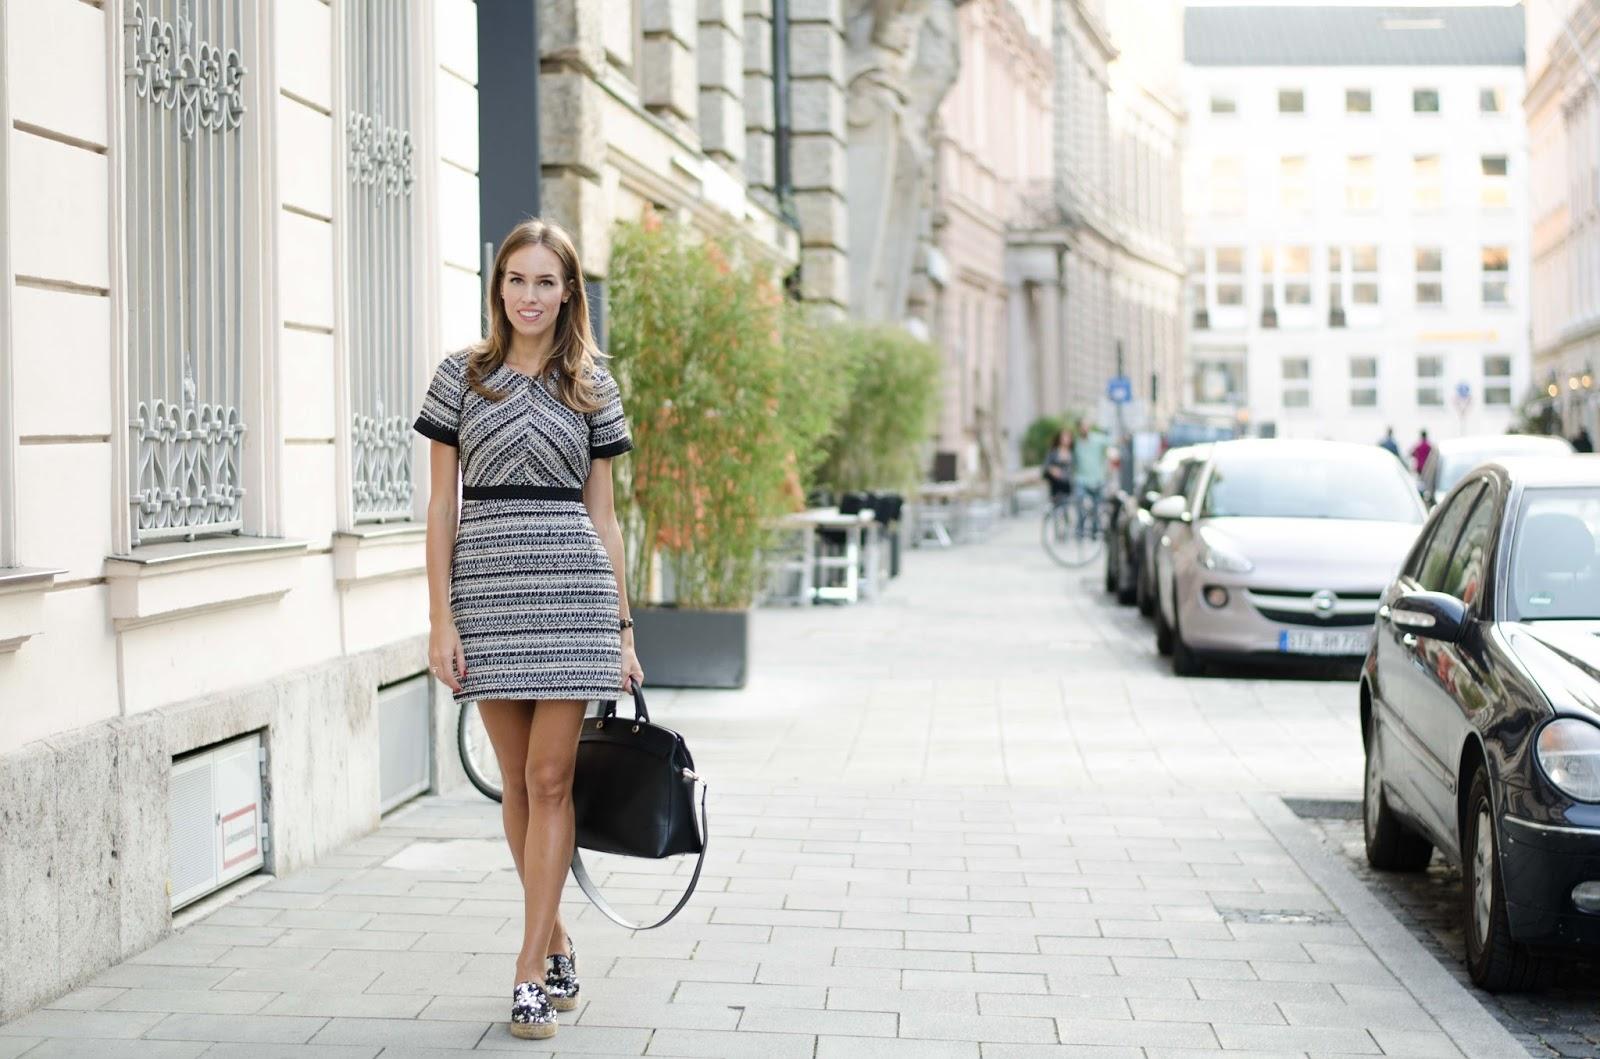 kristjaana mere hm structured mini dress fall outfit